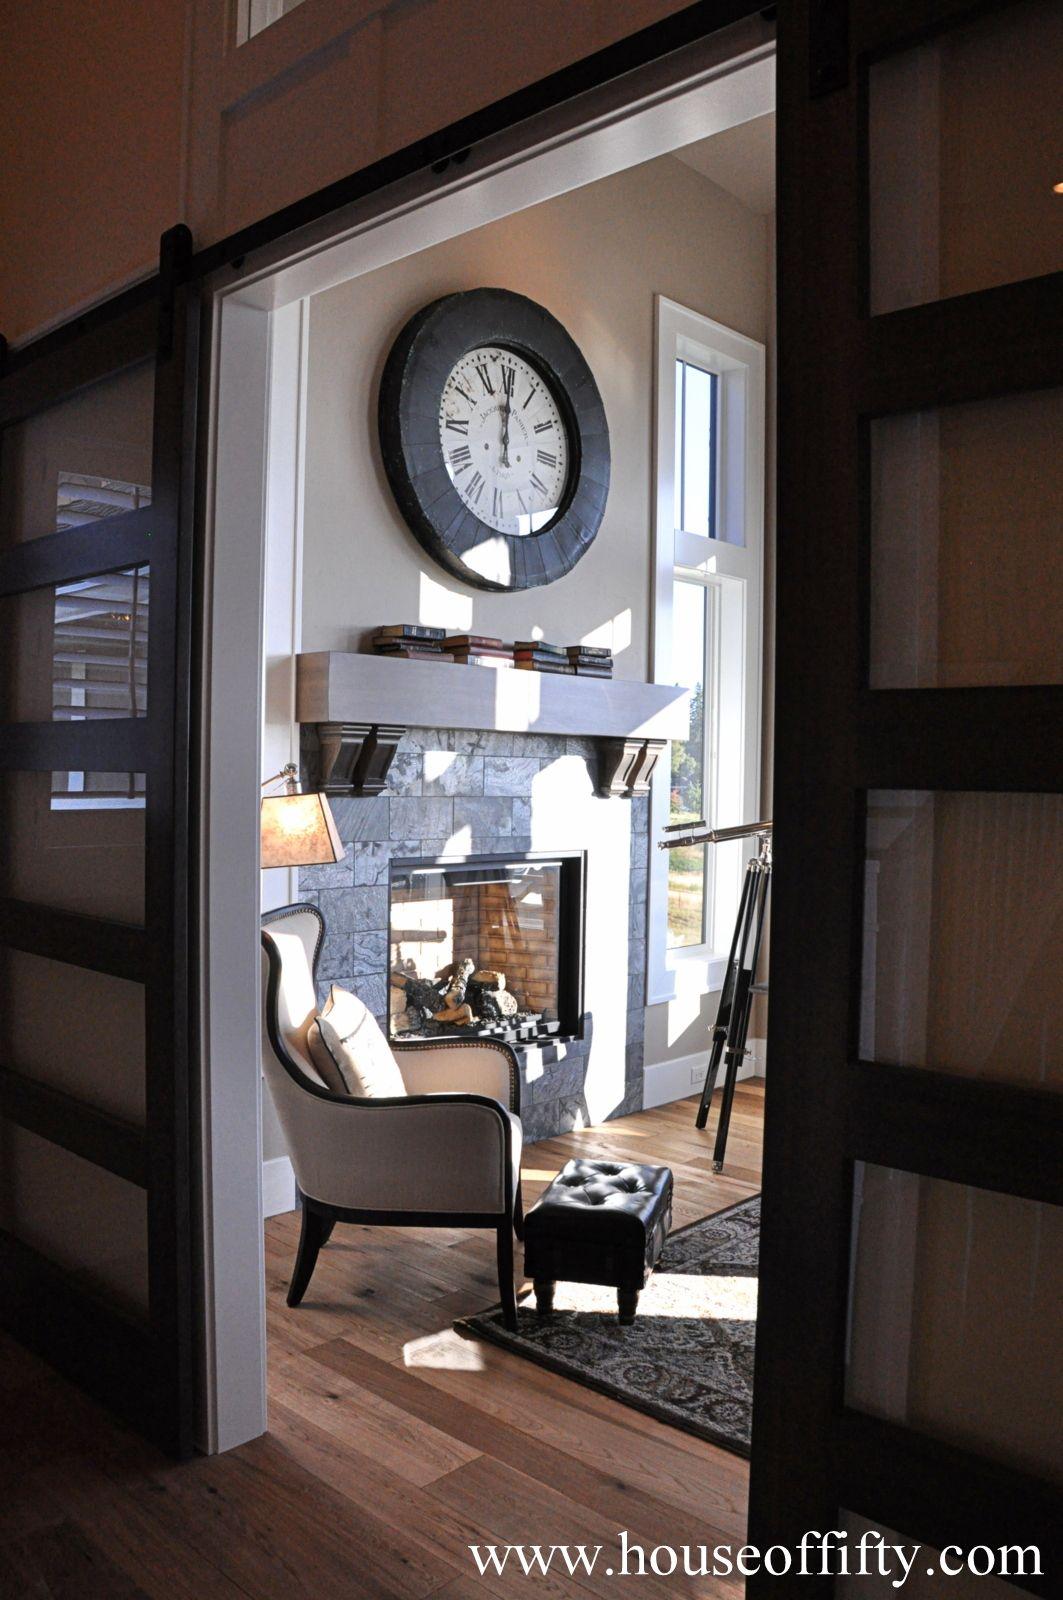 Fabulous Glass Barn Style Sliding Doorsalso Love The Wall Clock